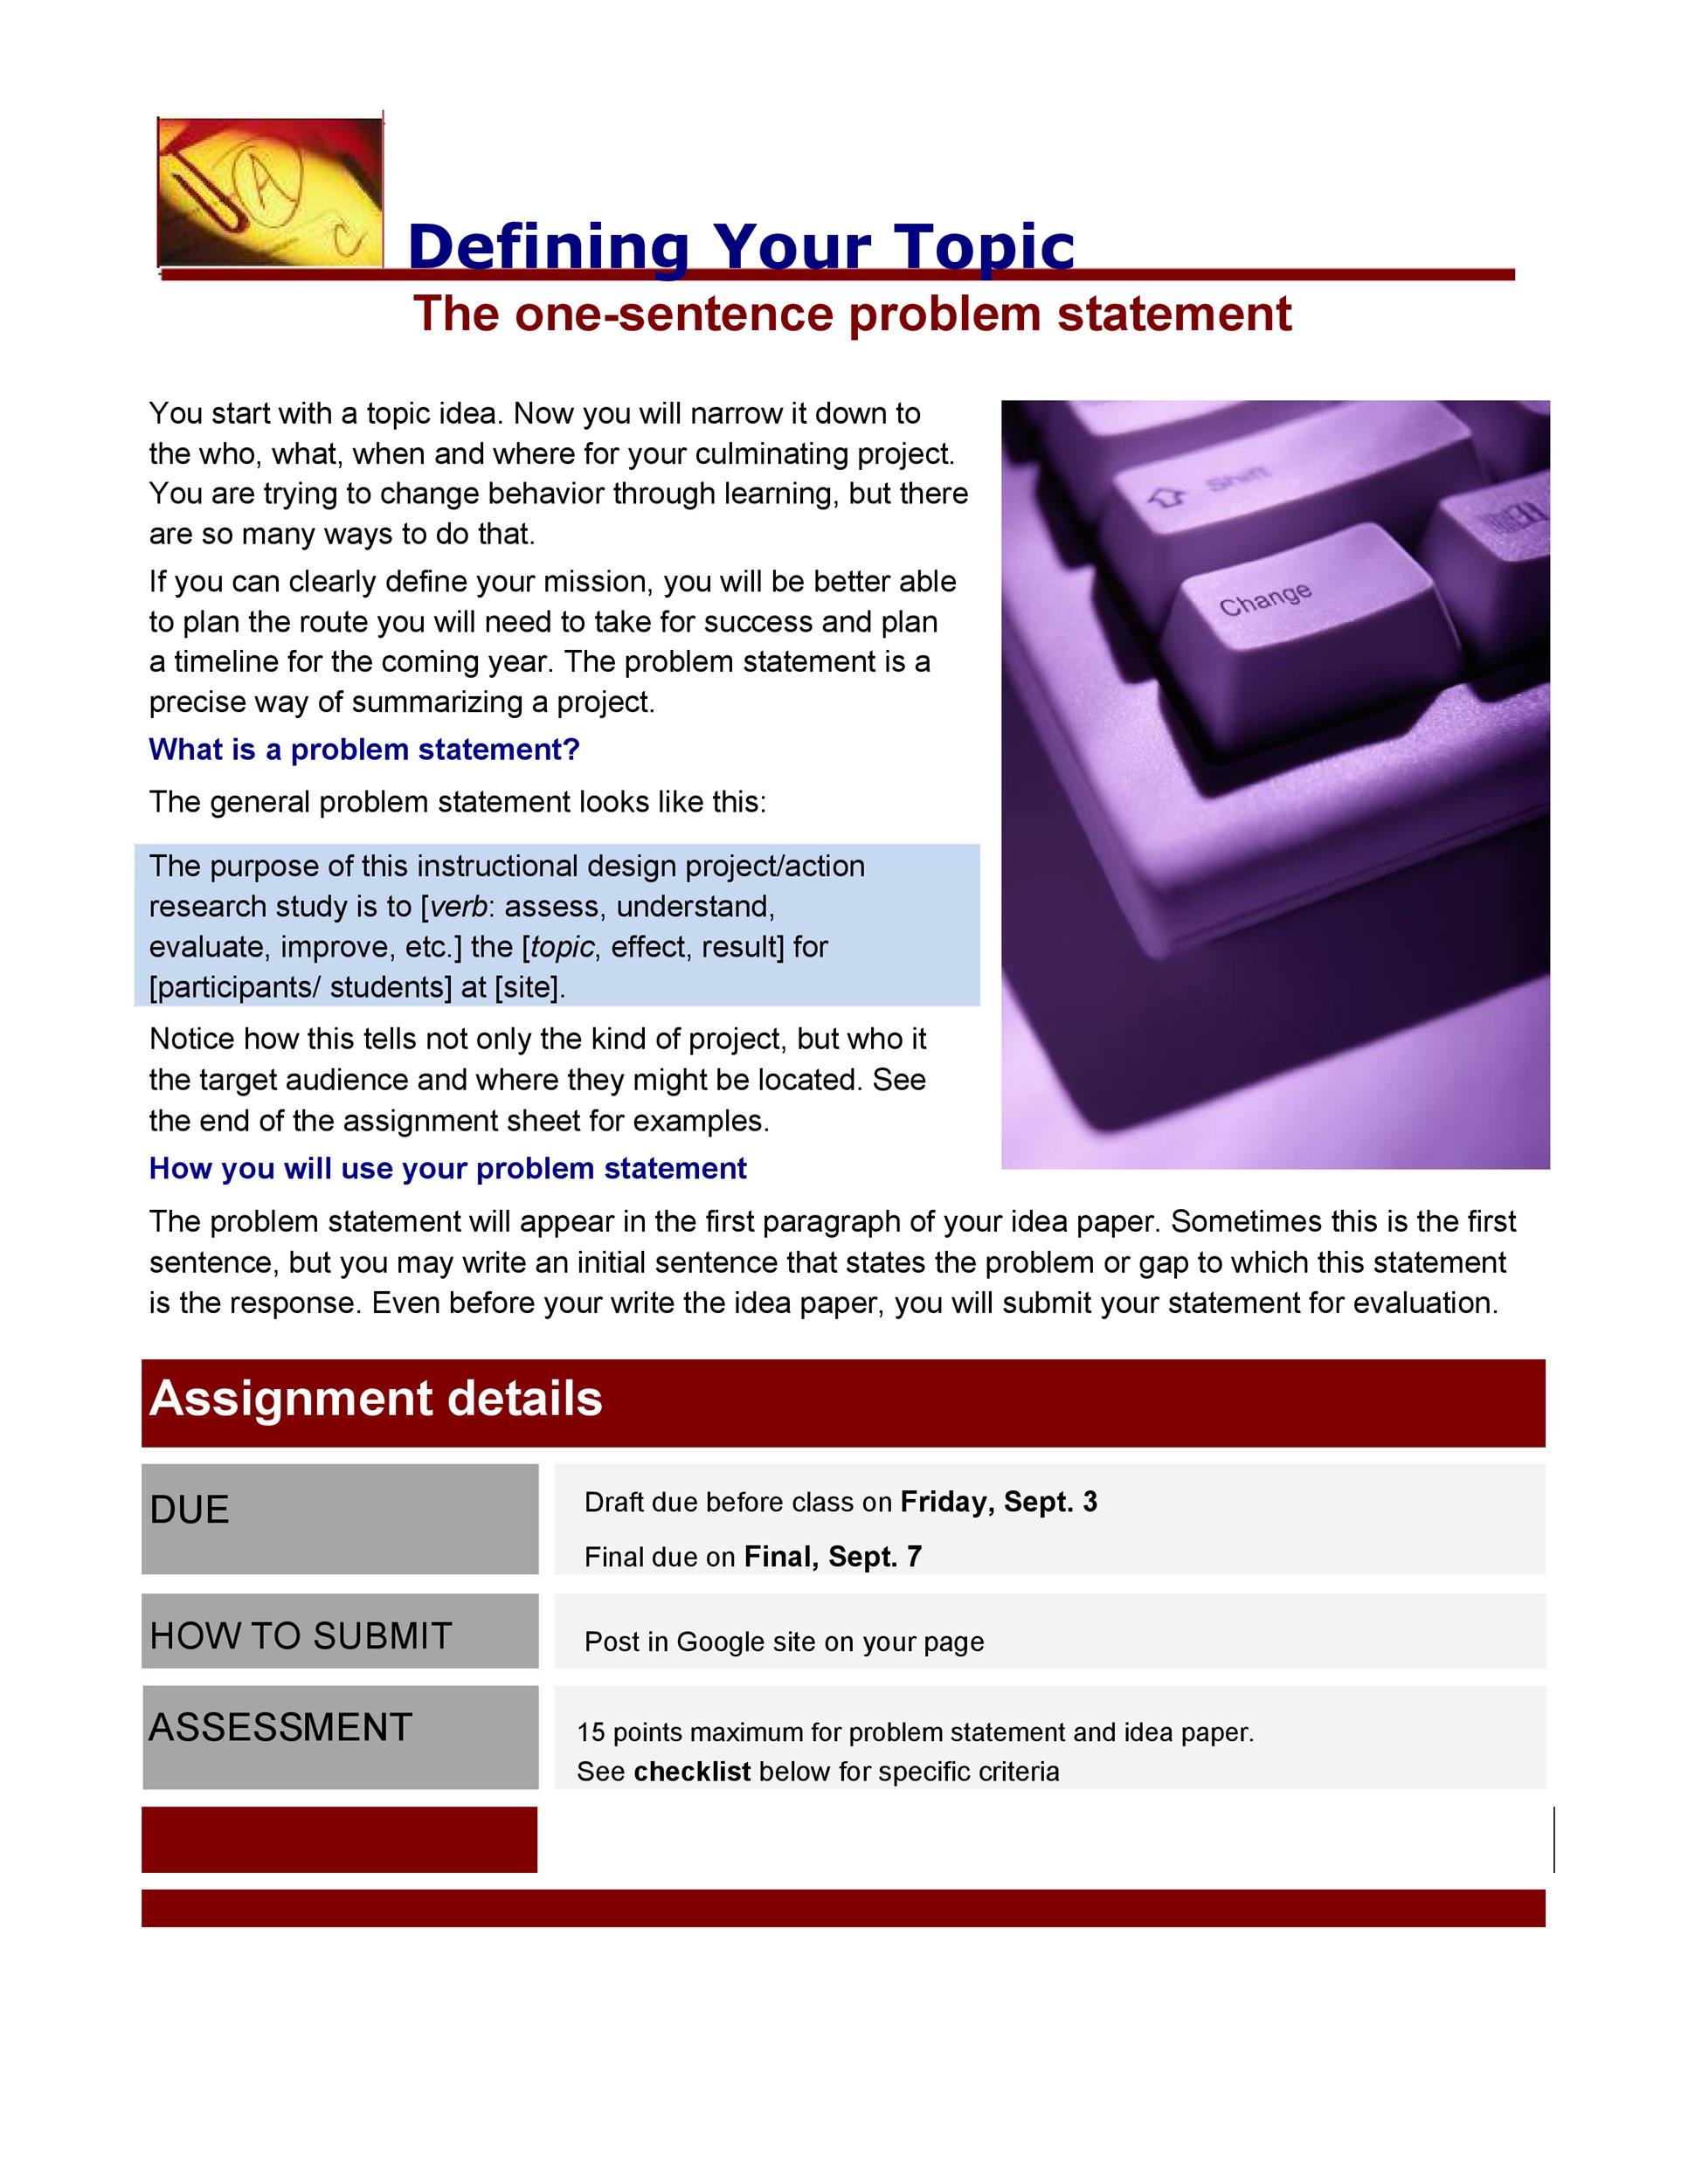 50 Printable Problem Statement Templates (MS Word) ᐅ ...